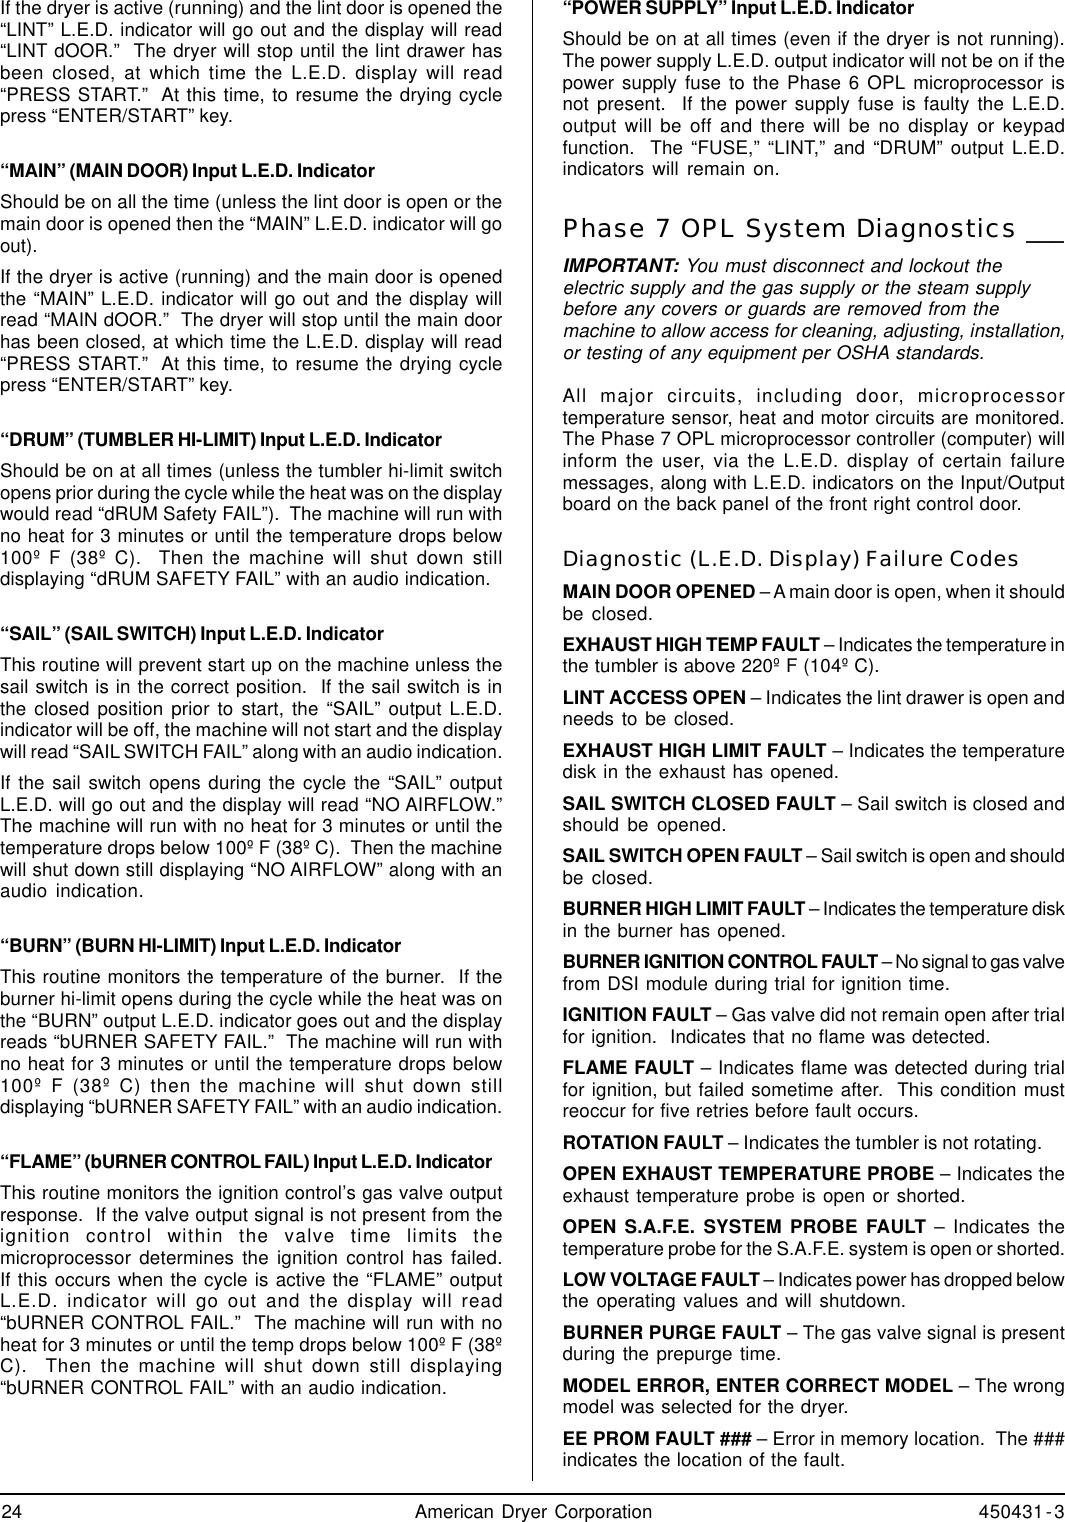 Adc Ml 175 Users Manual 96_122 Txt